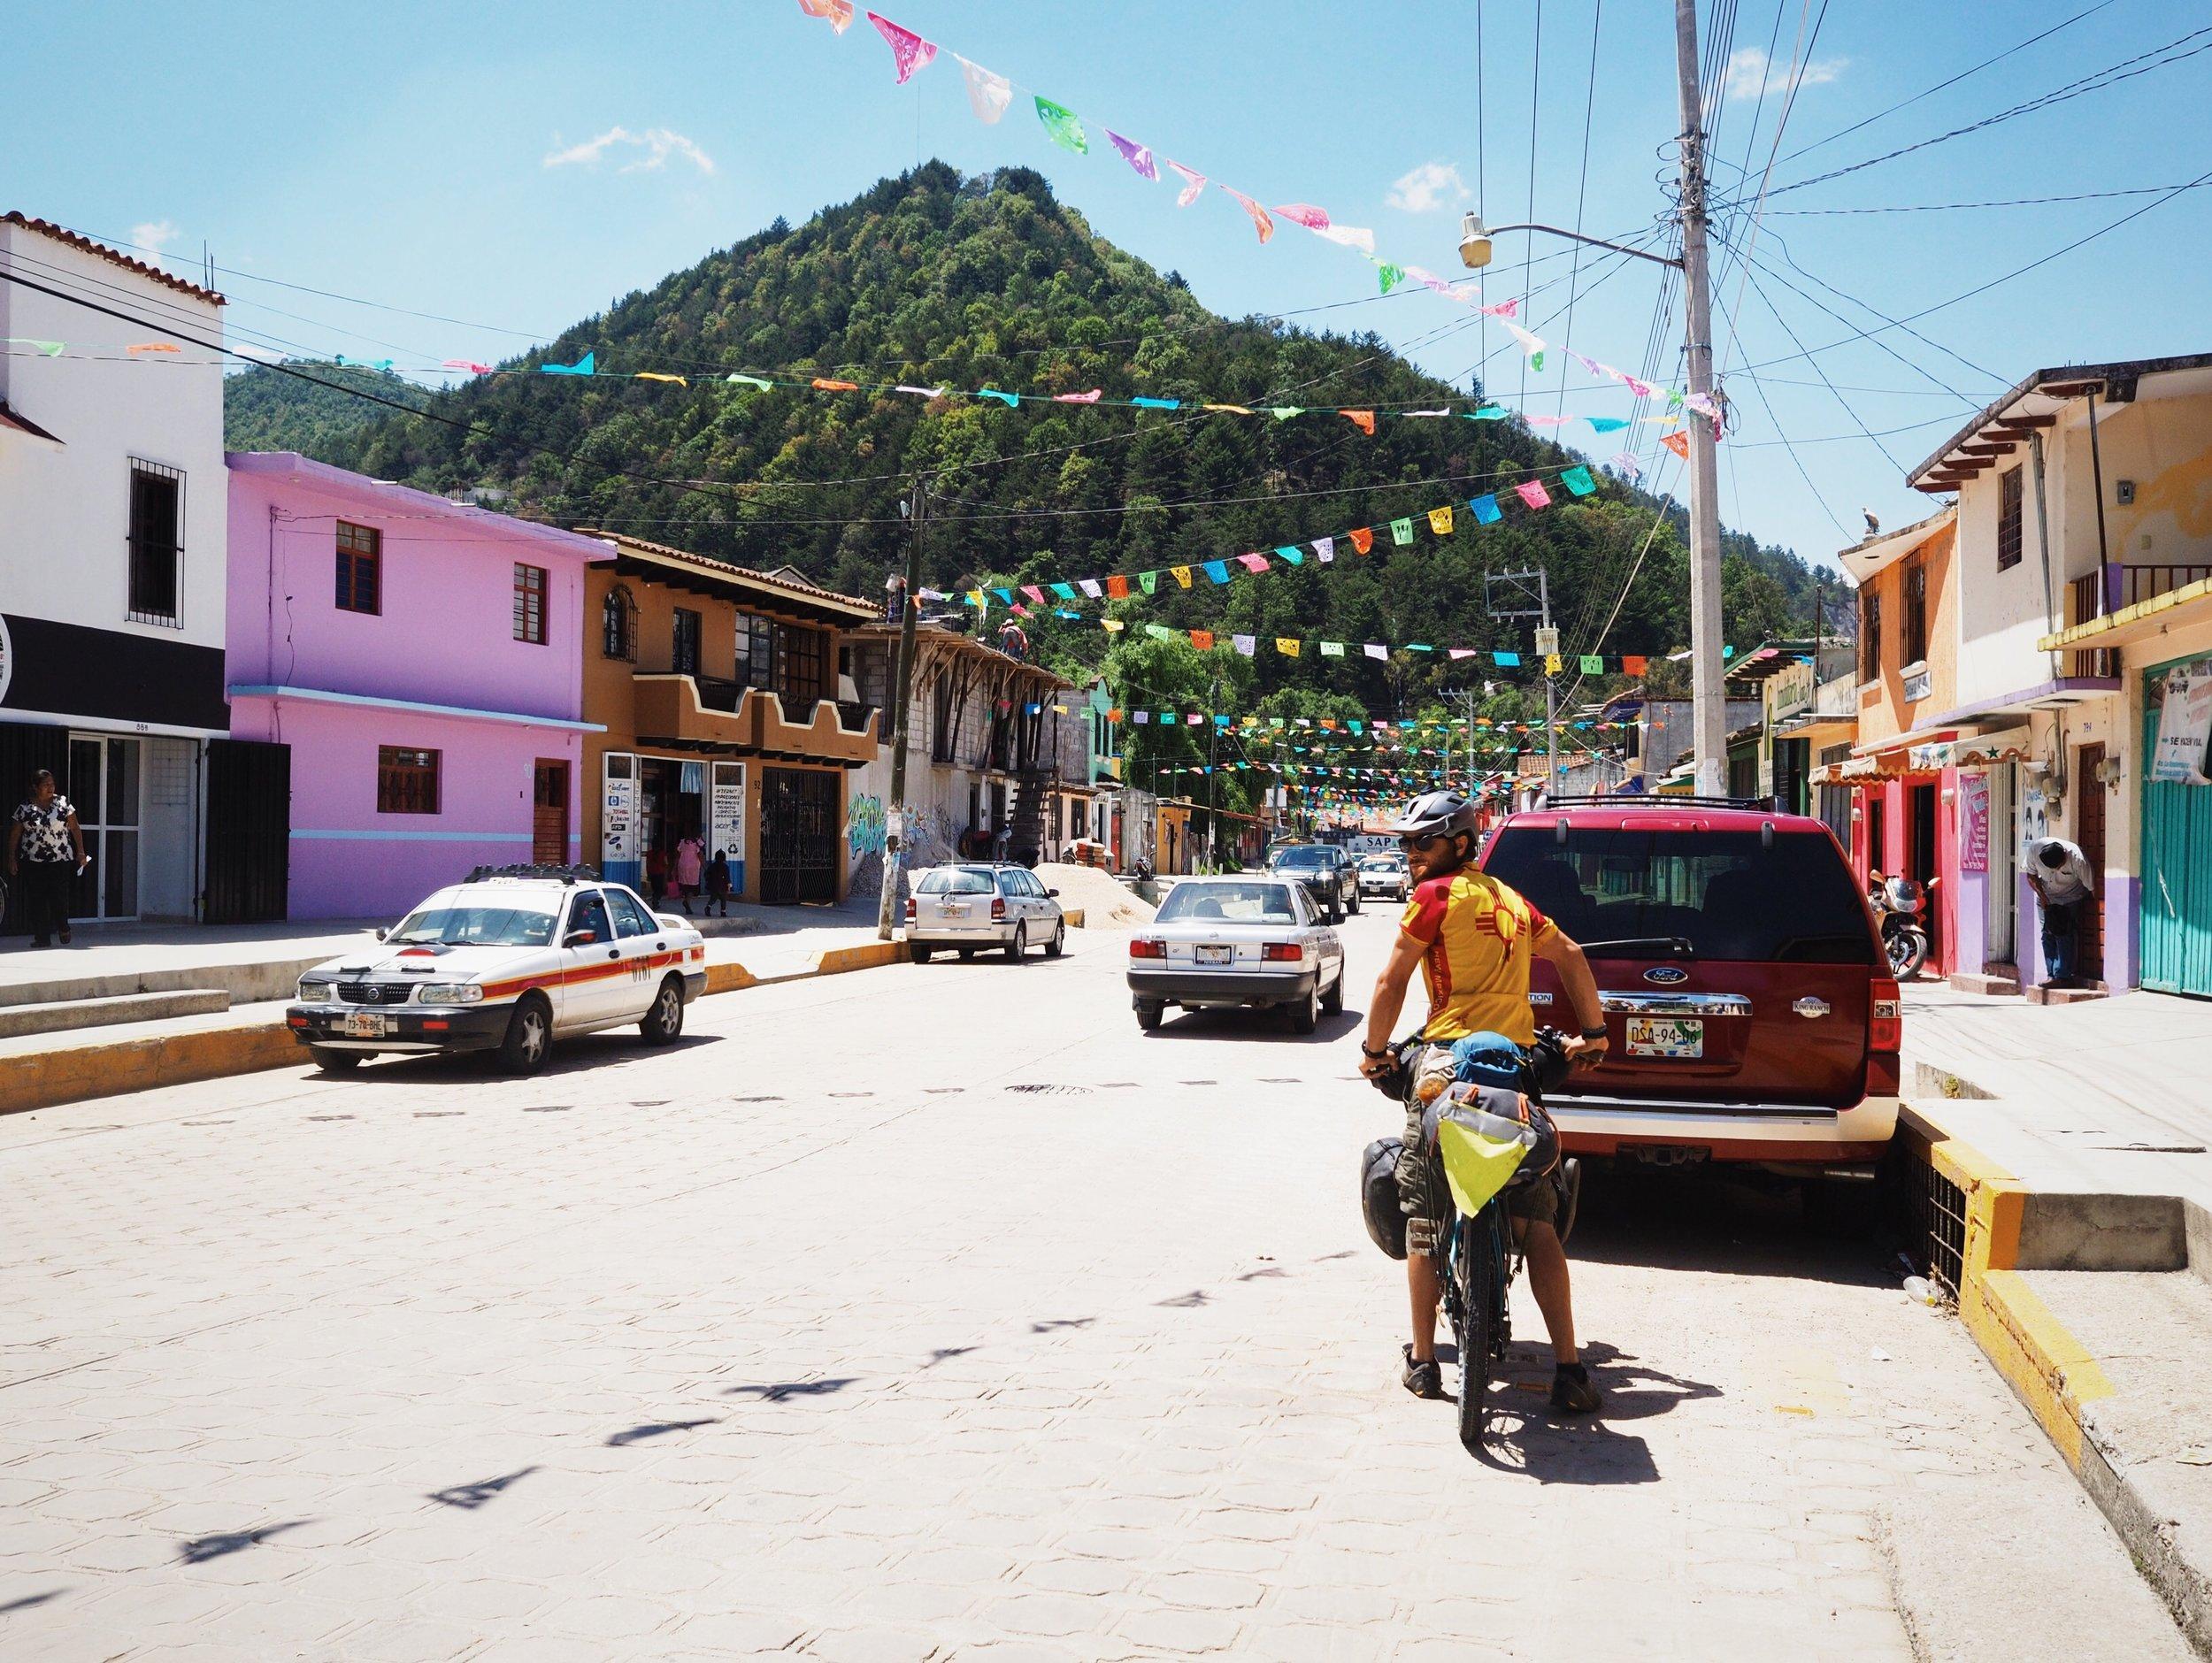 Leaving San Cristóbal